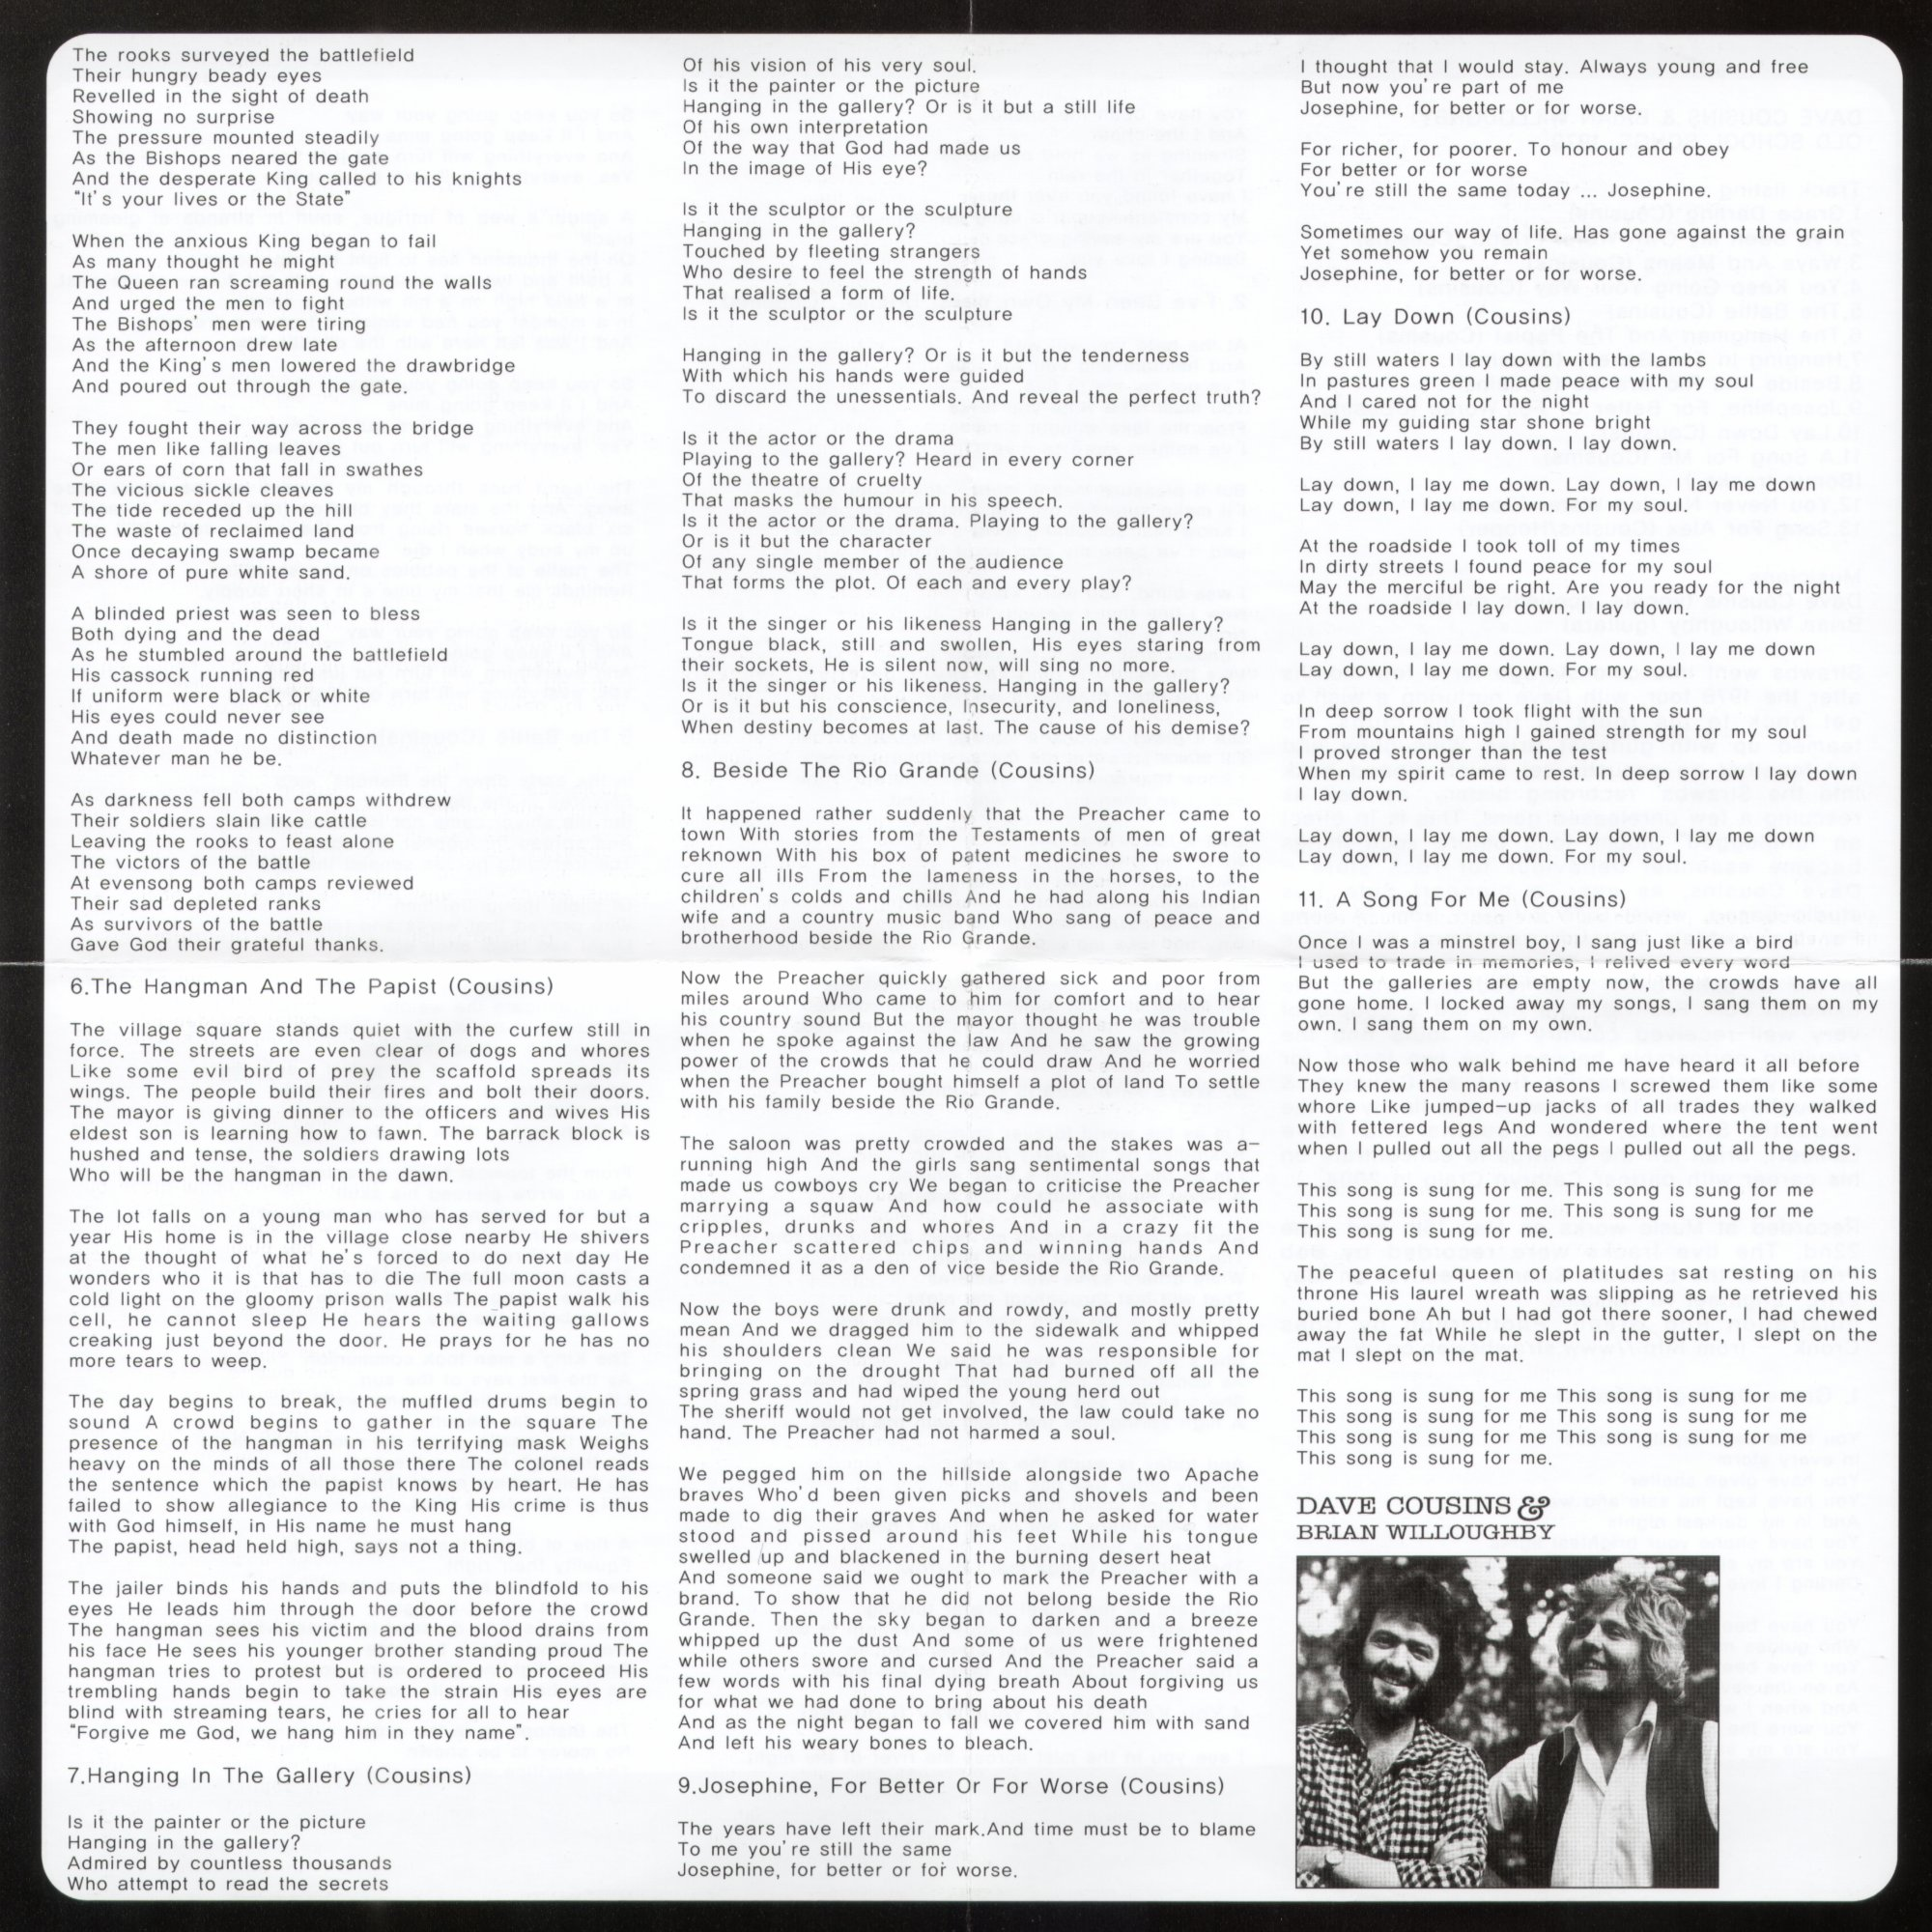 STRAWBSWEB - Albums - Old School Songs - Versions